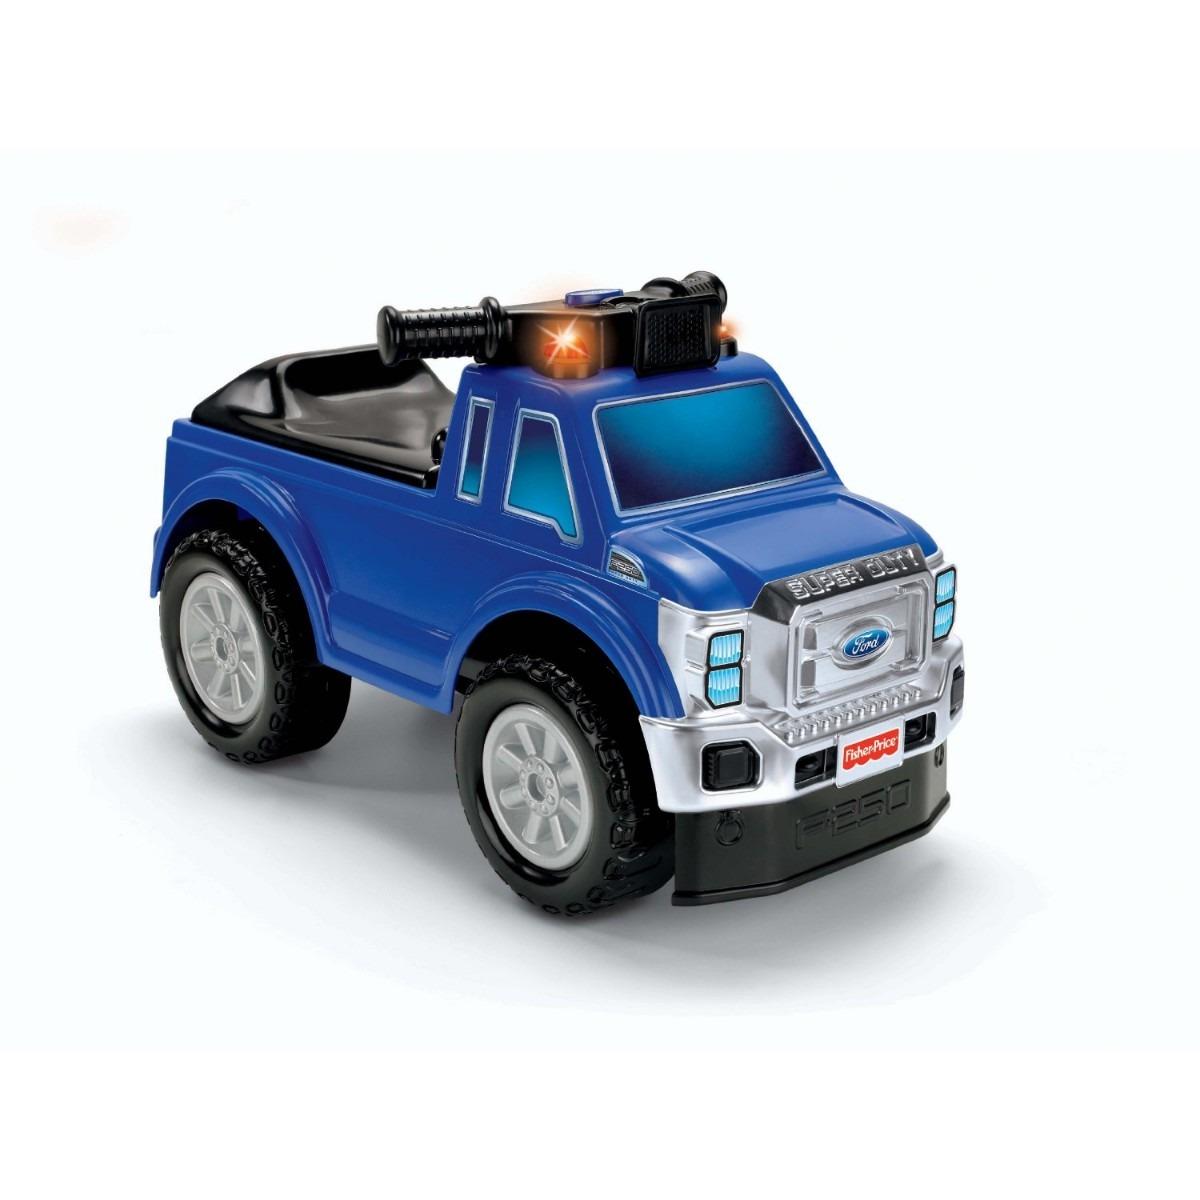 Toy Car Price